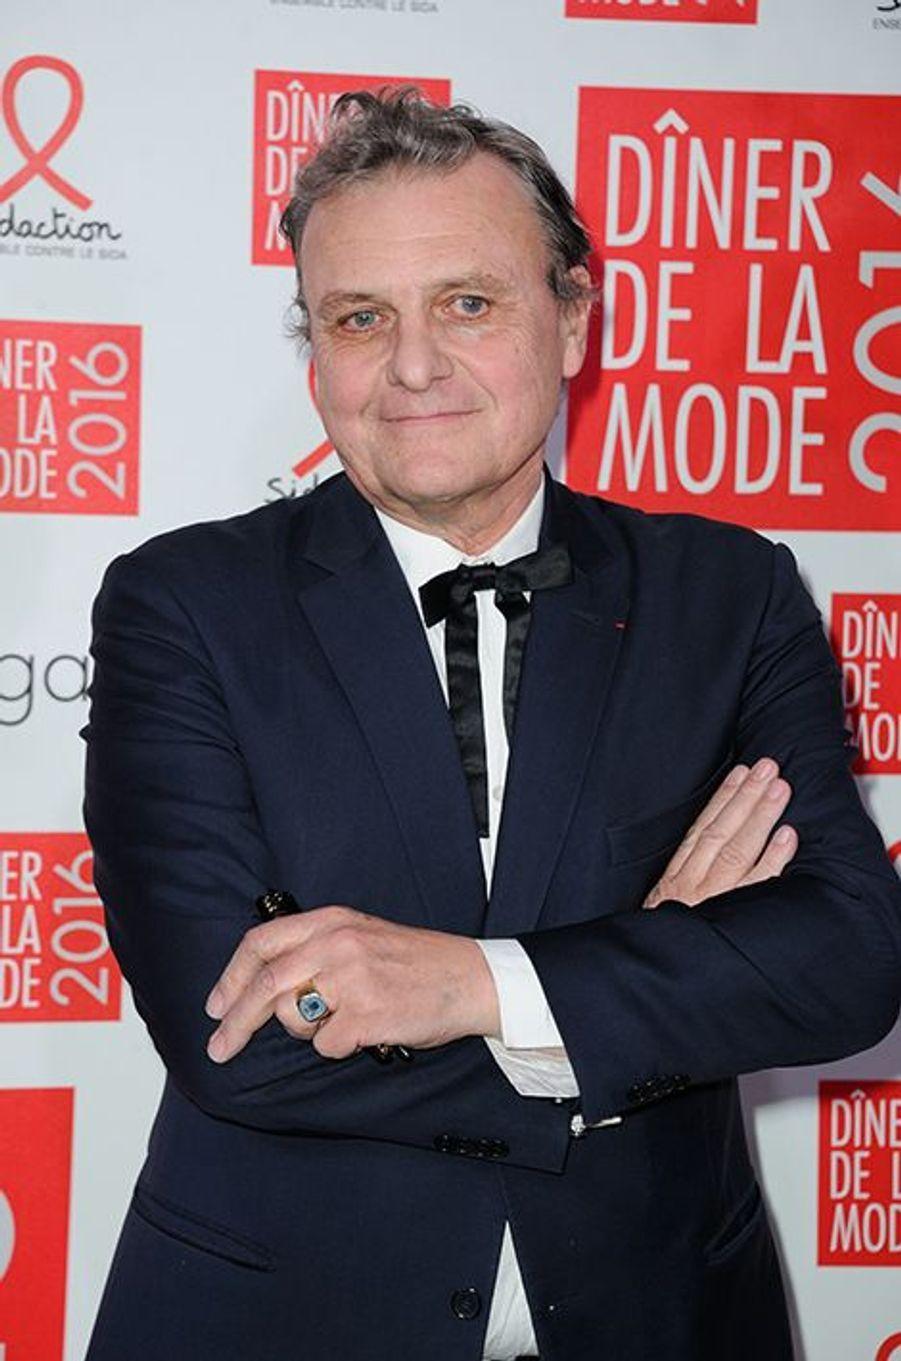 Jean-Charles de Castelbaljac